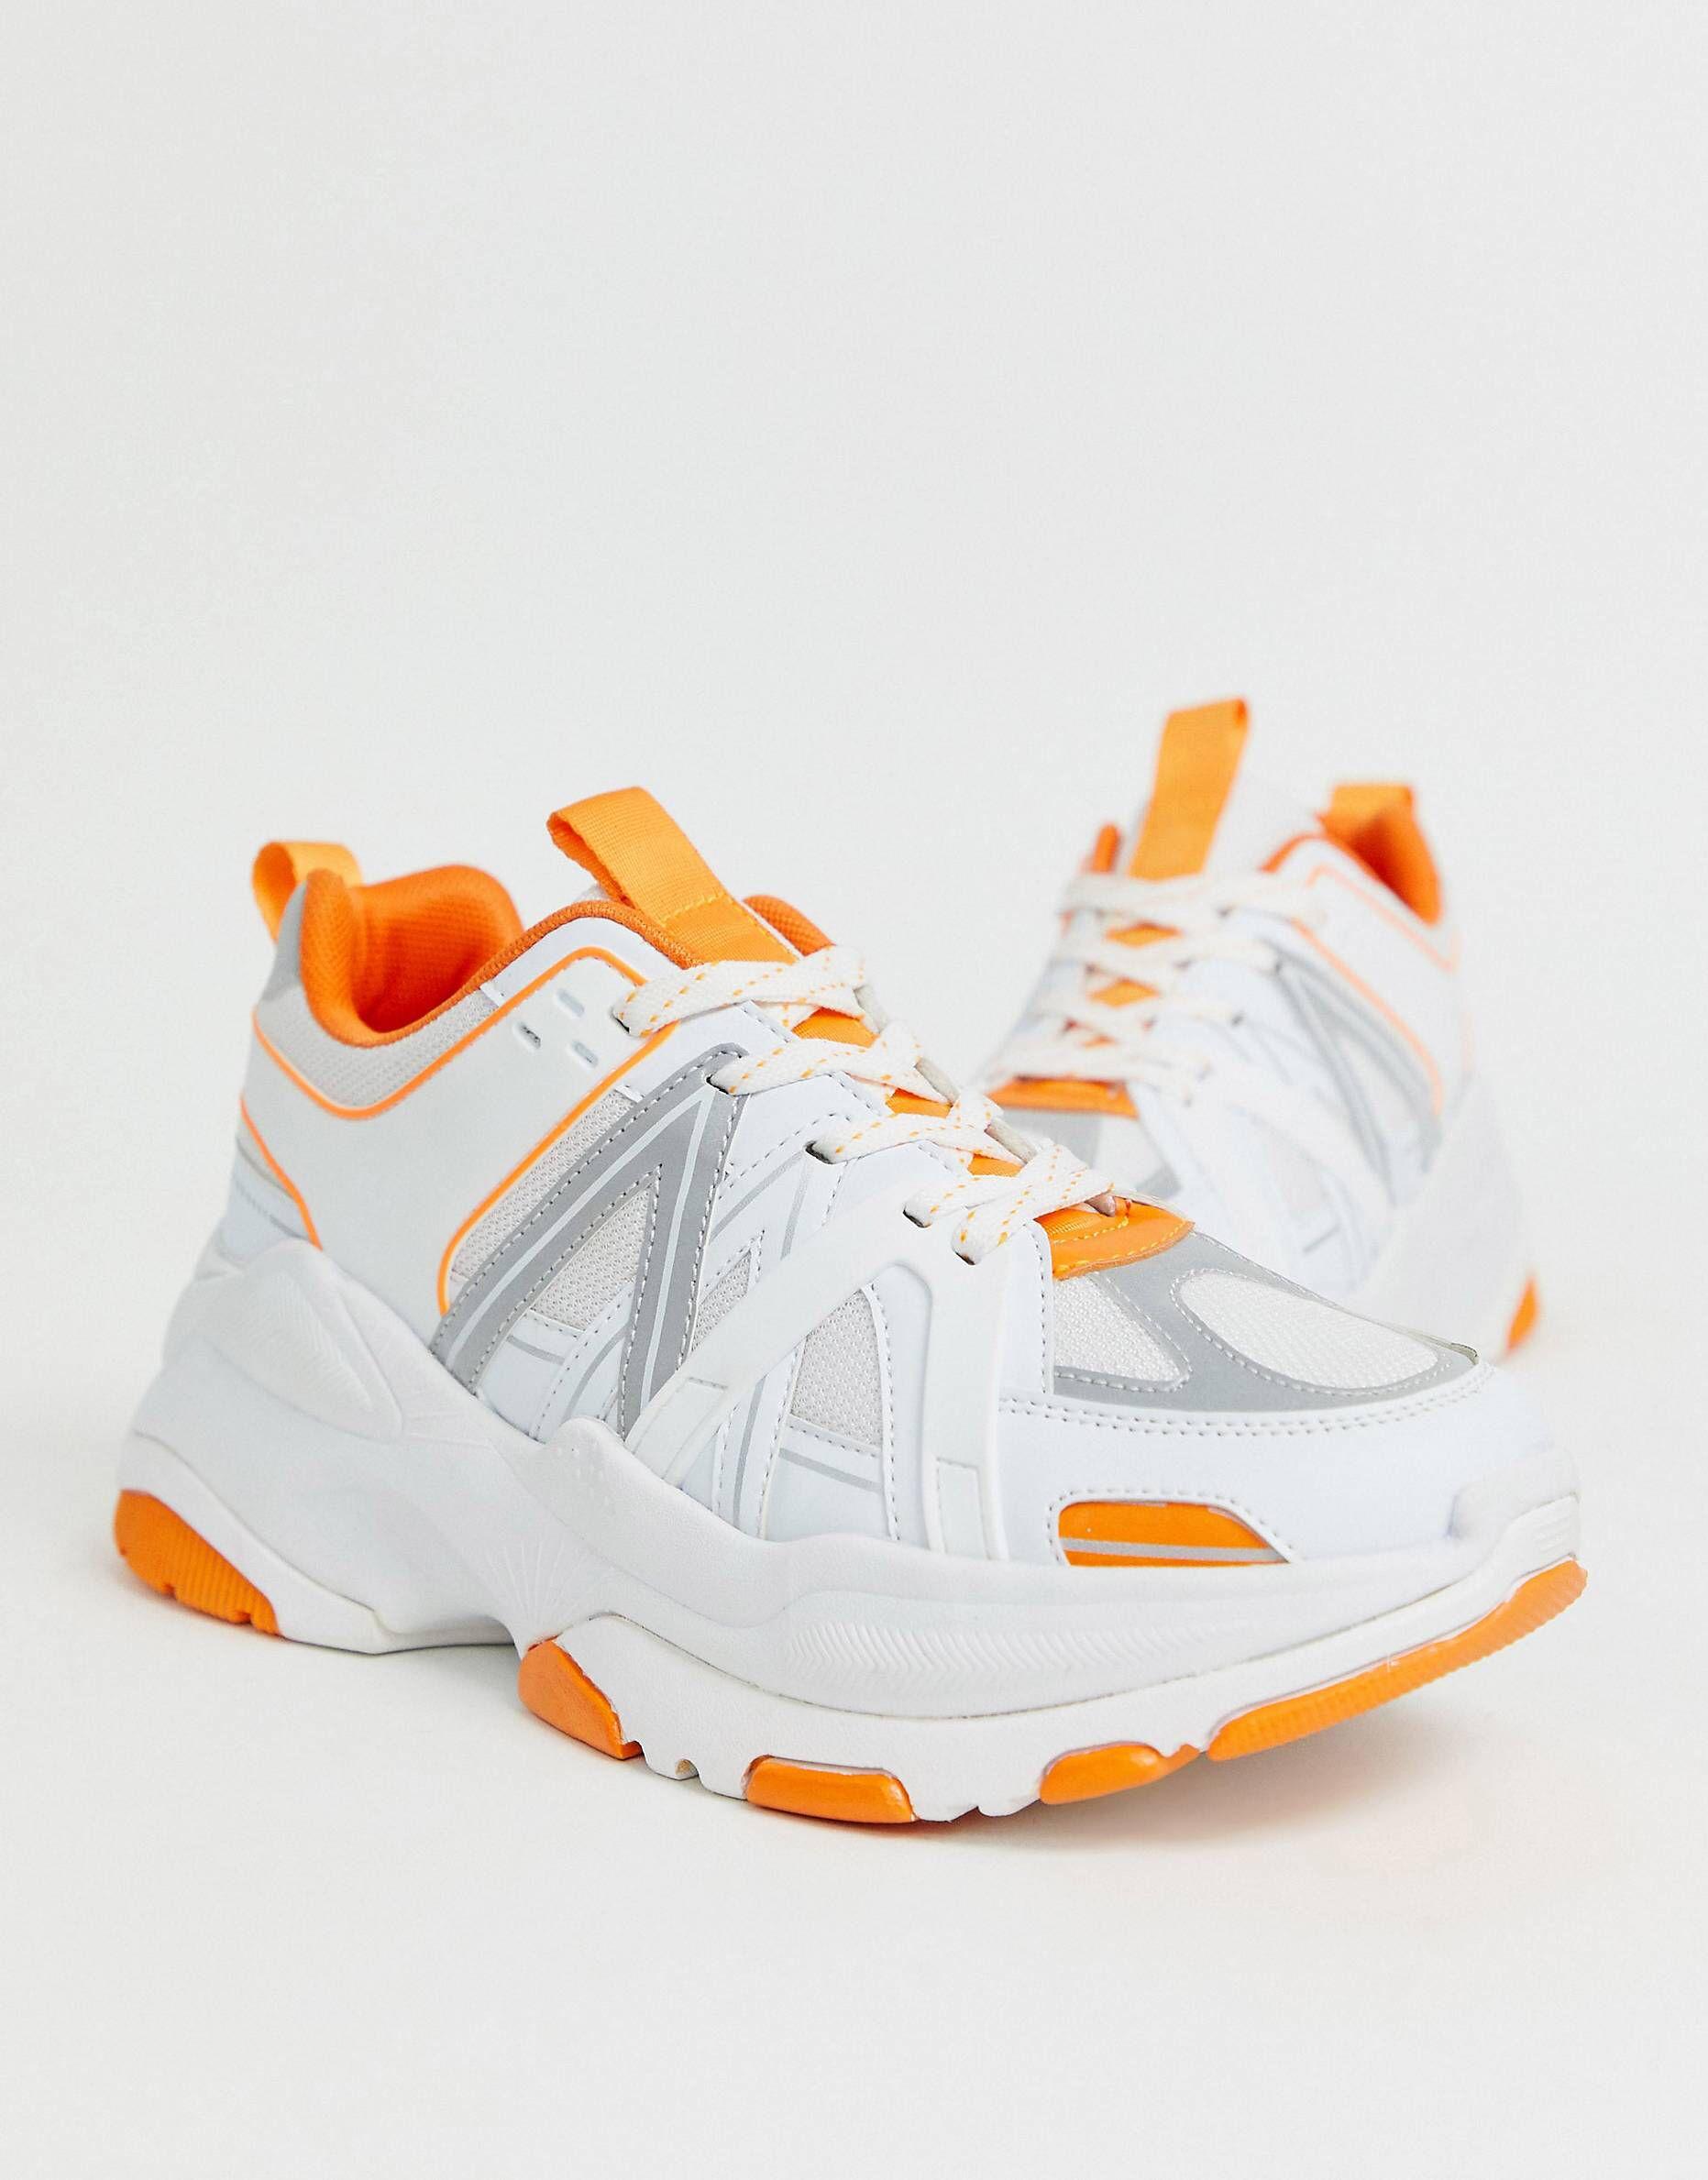 Asos designs, White trainers